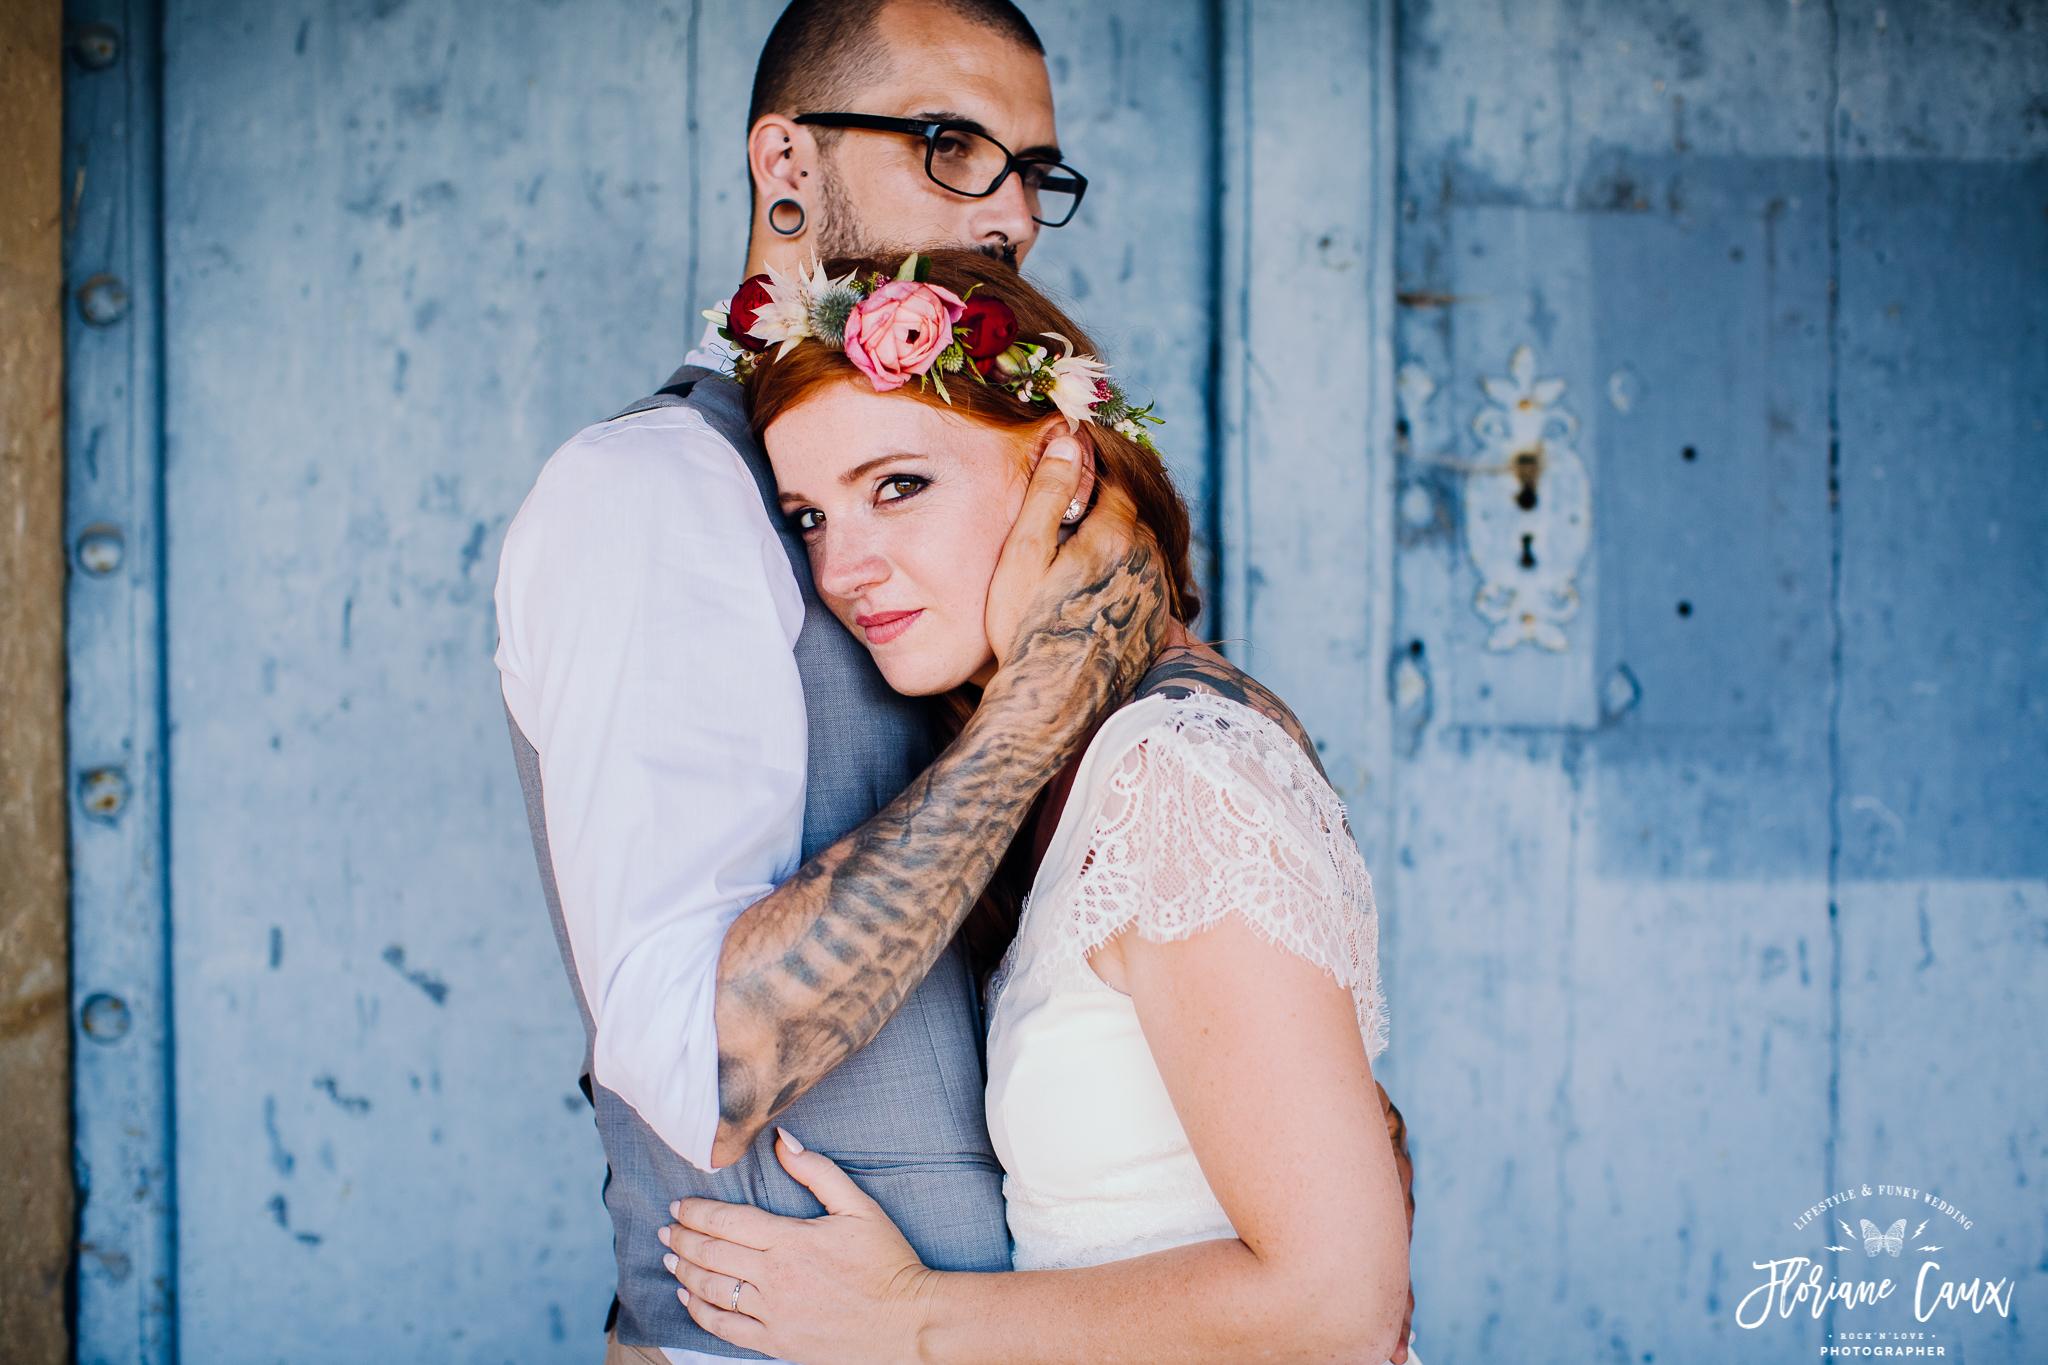 photographe-mariage-toulouse-rocknroll-maries-tatoues-floriane-caux-52